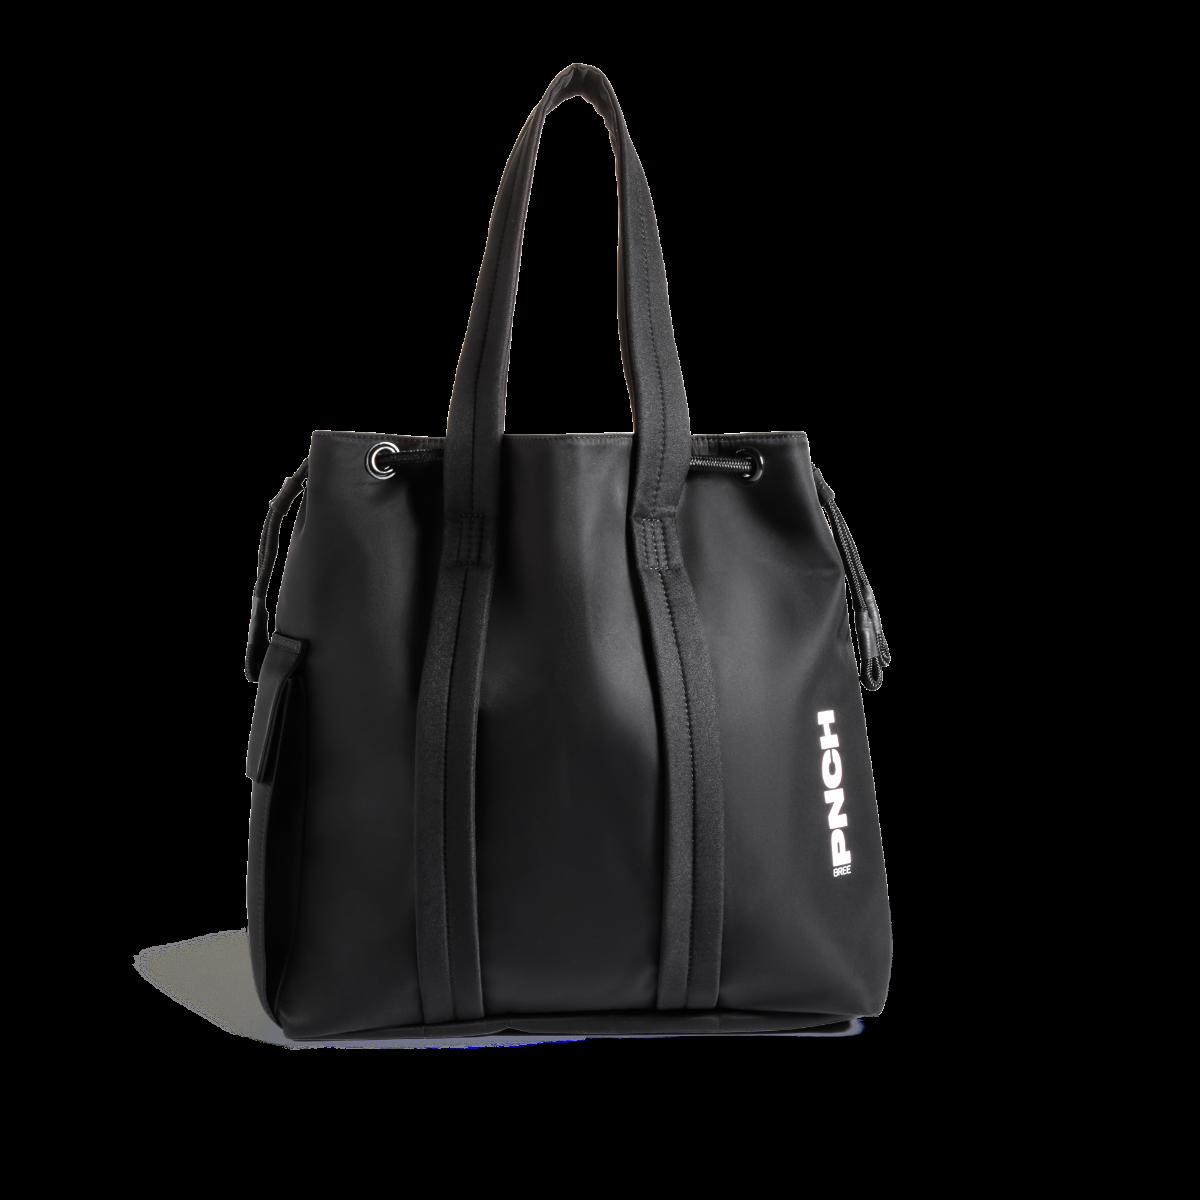 PNCH Neo 3 - Black - Shopper